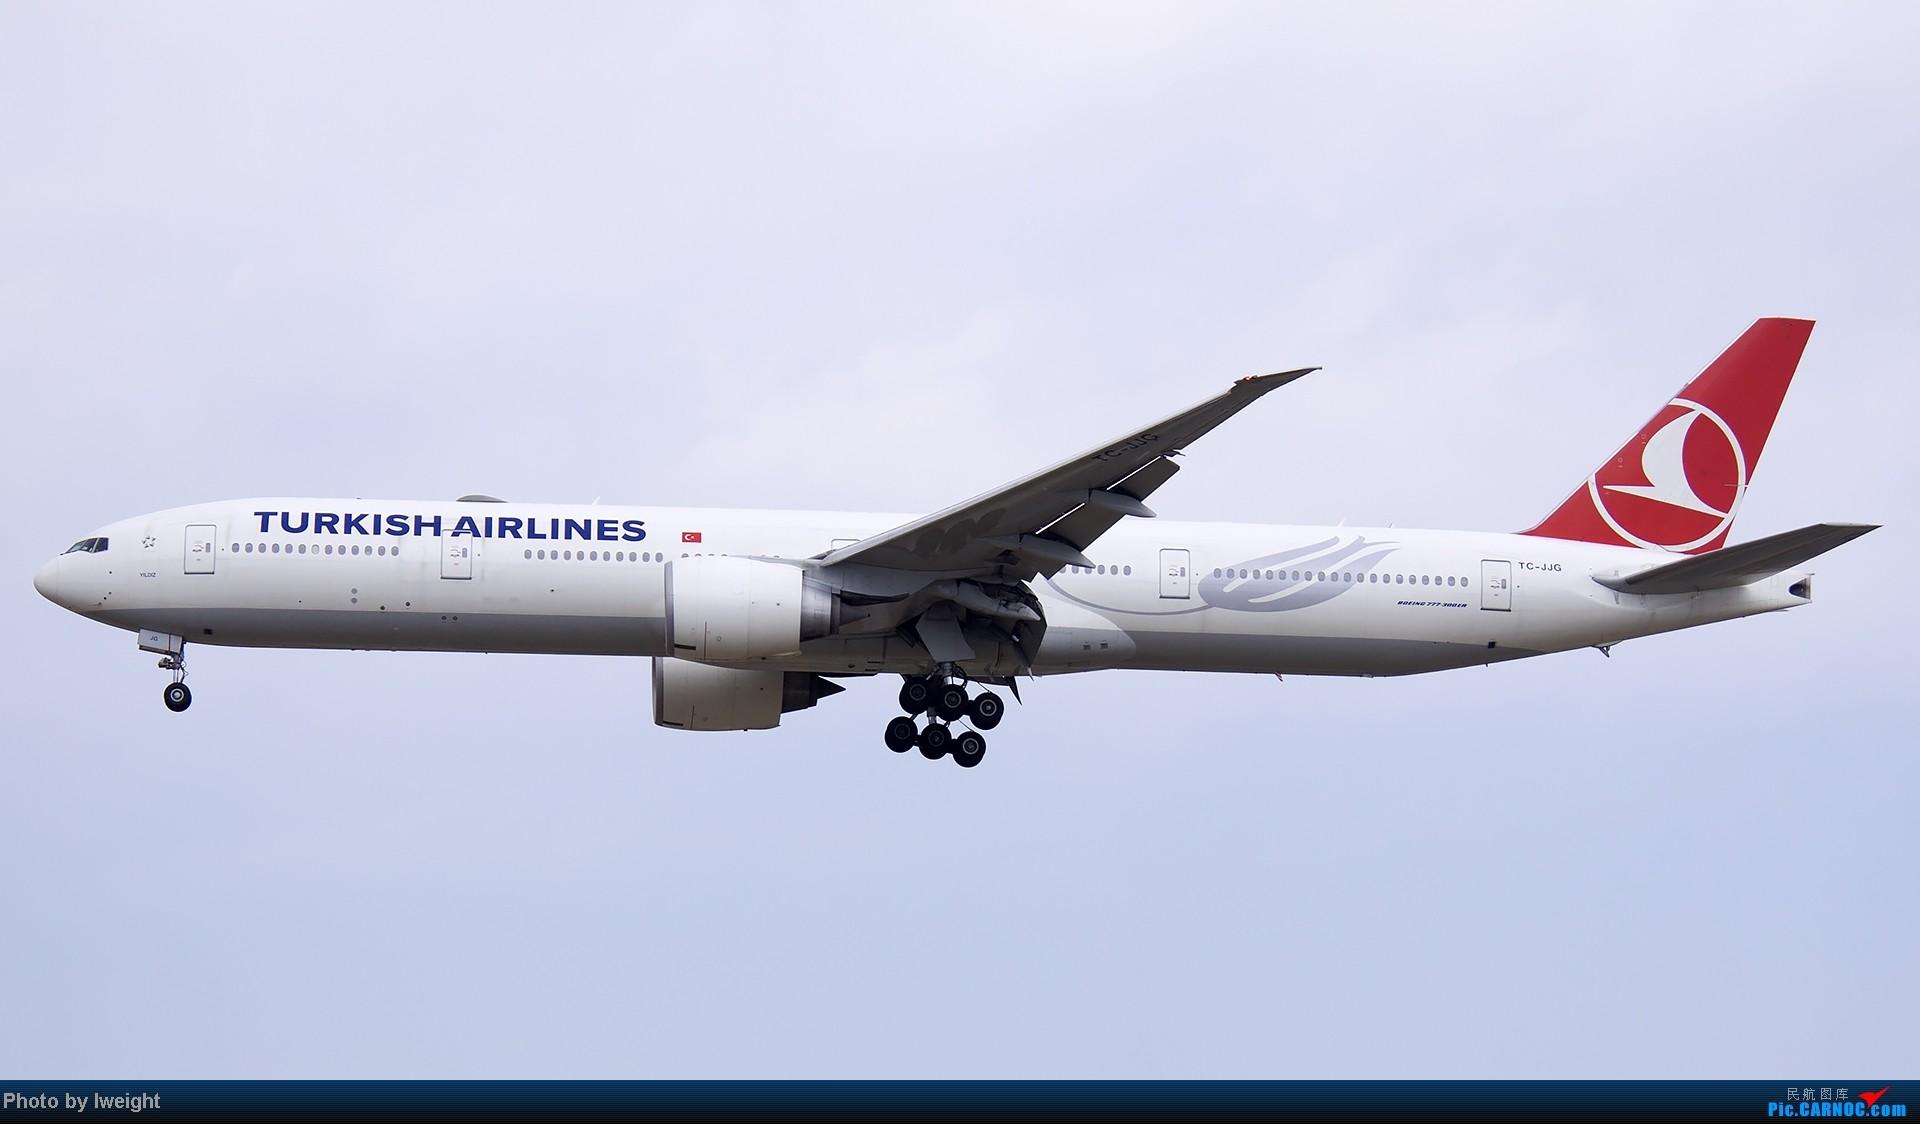 Re:[原创]北京难得的好天气,收获多种机型和彩绘,遗憾的是再次错过卡航巴塞罗那彩绘 BOEING 777-300 TC-JJG 中国北京首都机场